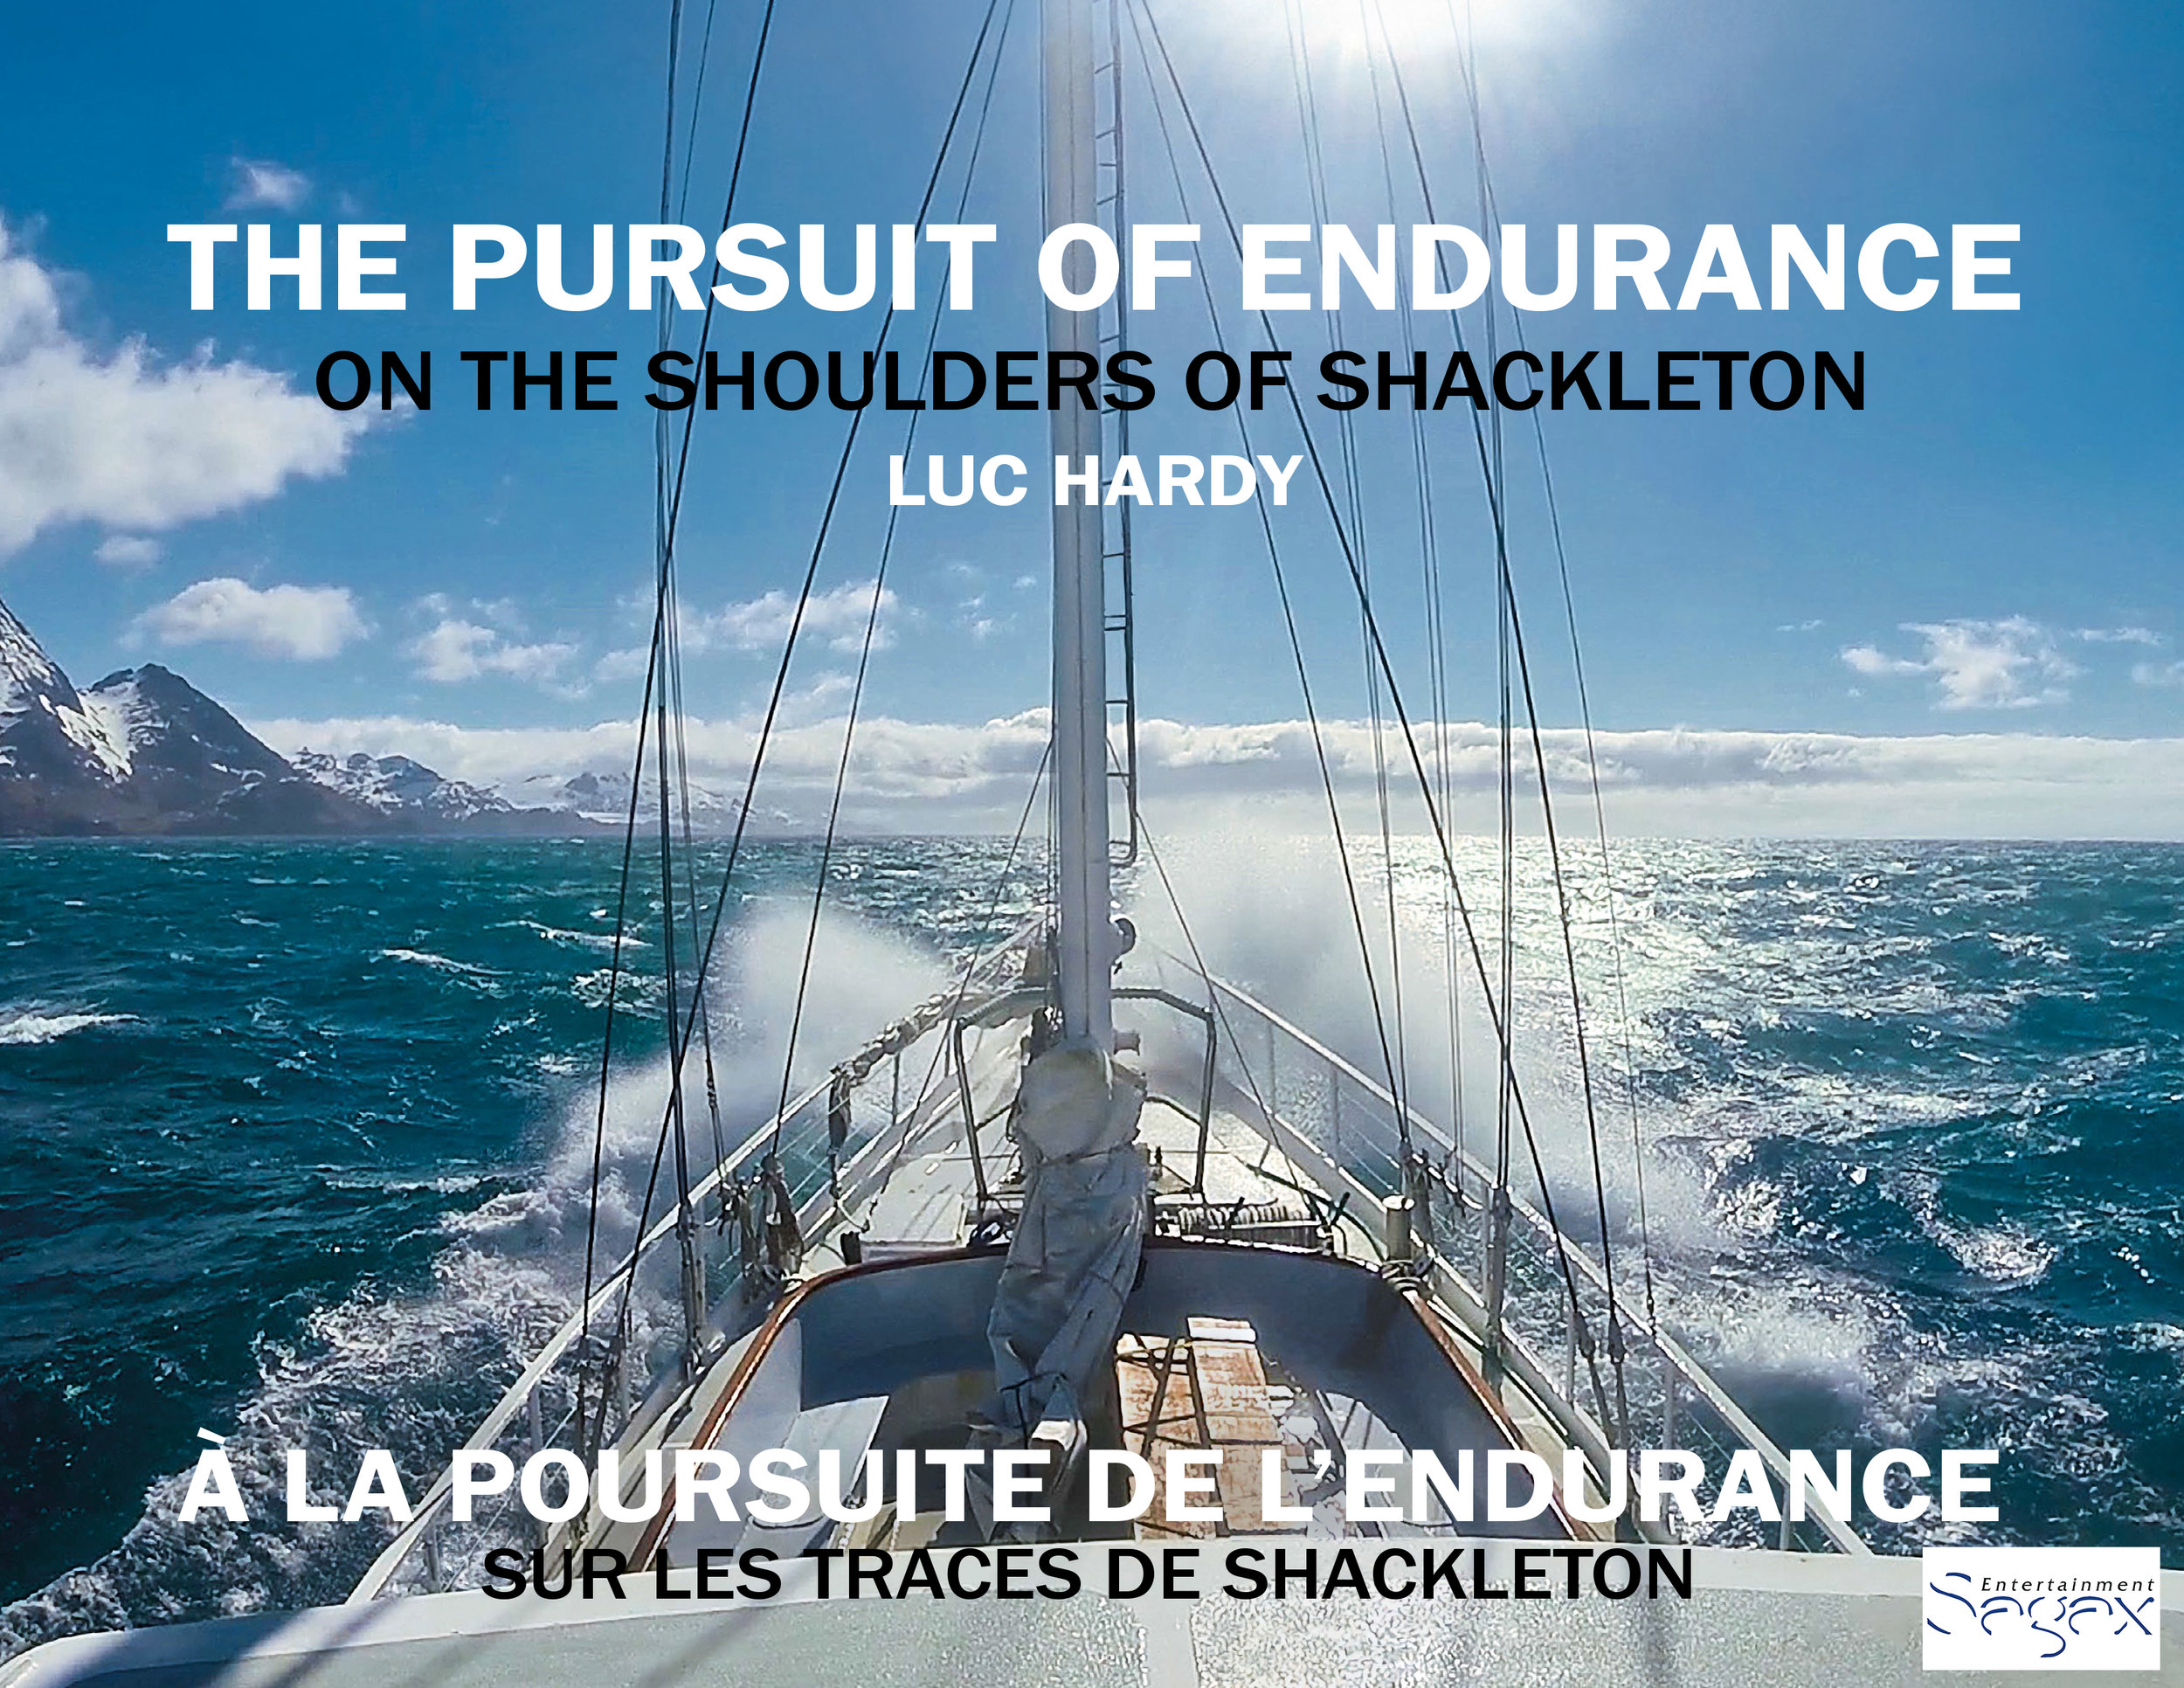 Pax Arctica-Endurance_Book_Single_Pages@ Luc Hardy-avec logo SAGAX ENTERTAINMENT 2.0.jpg